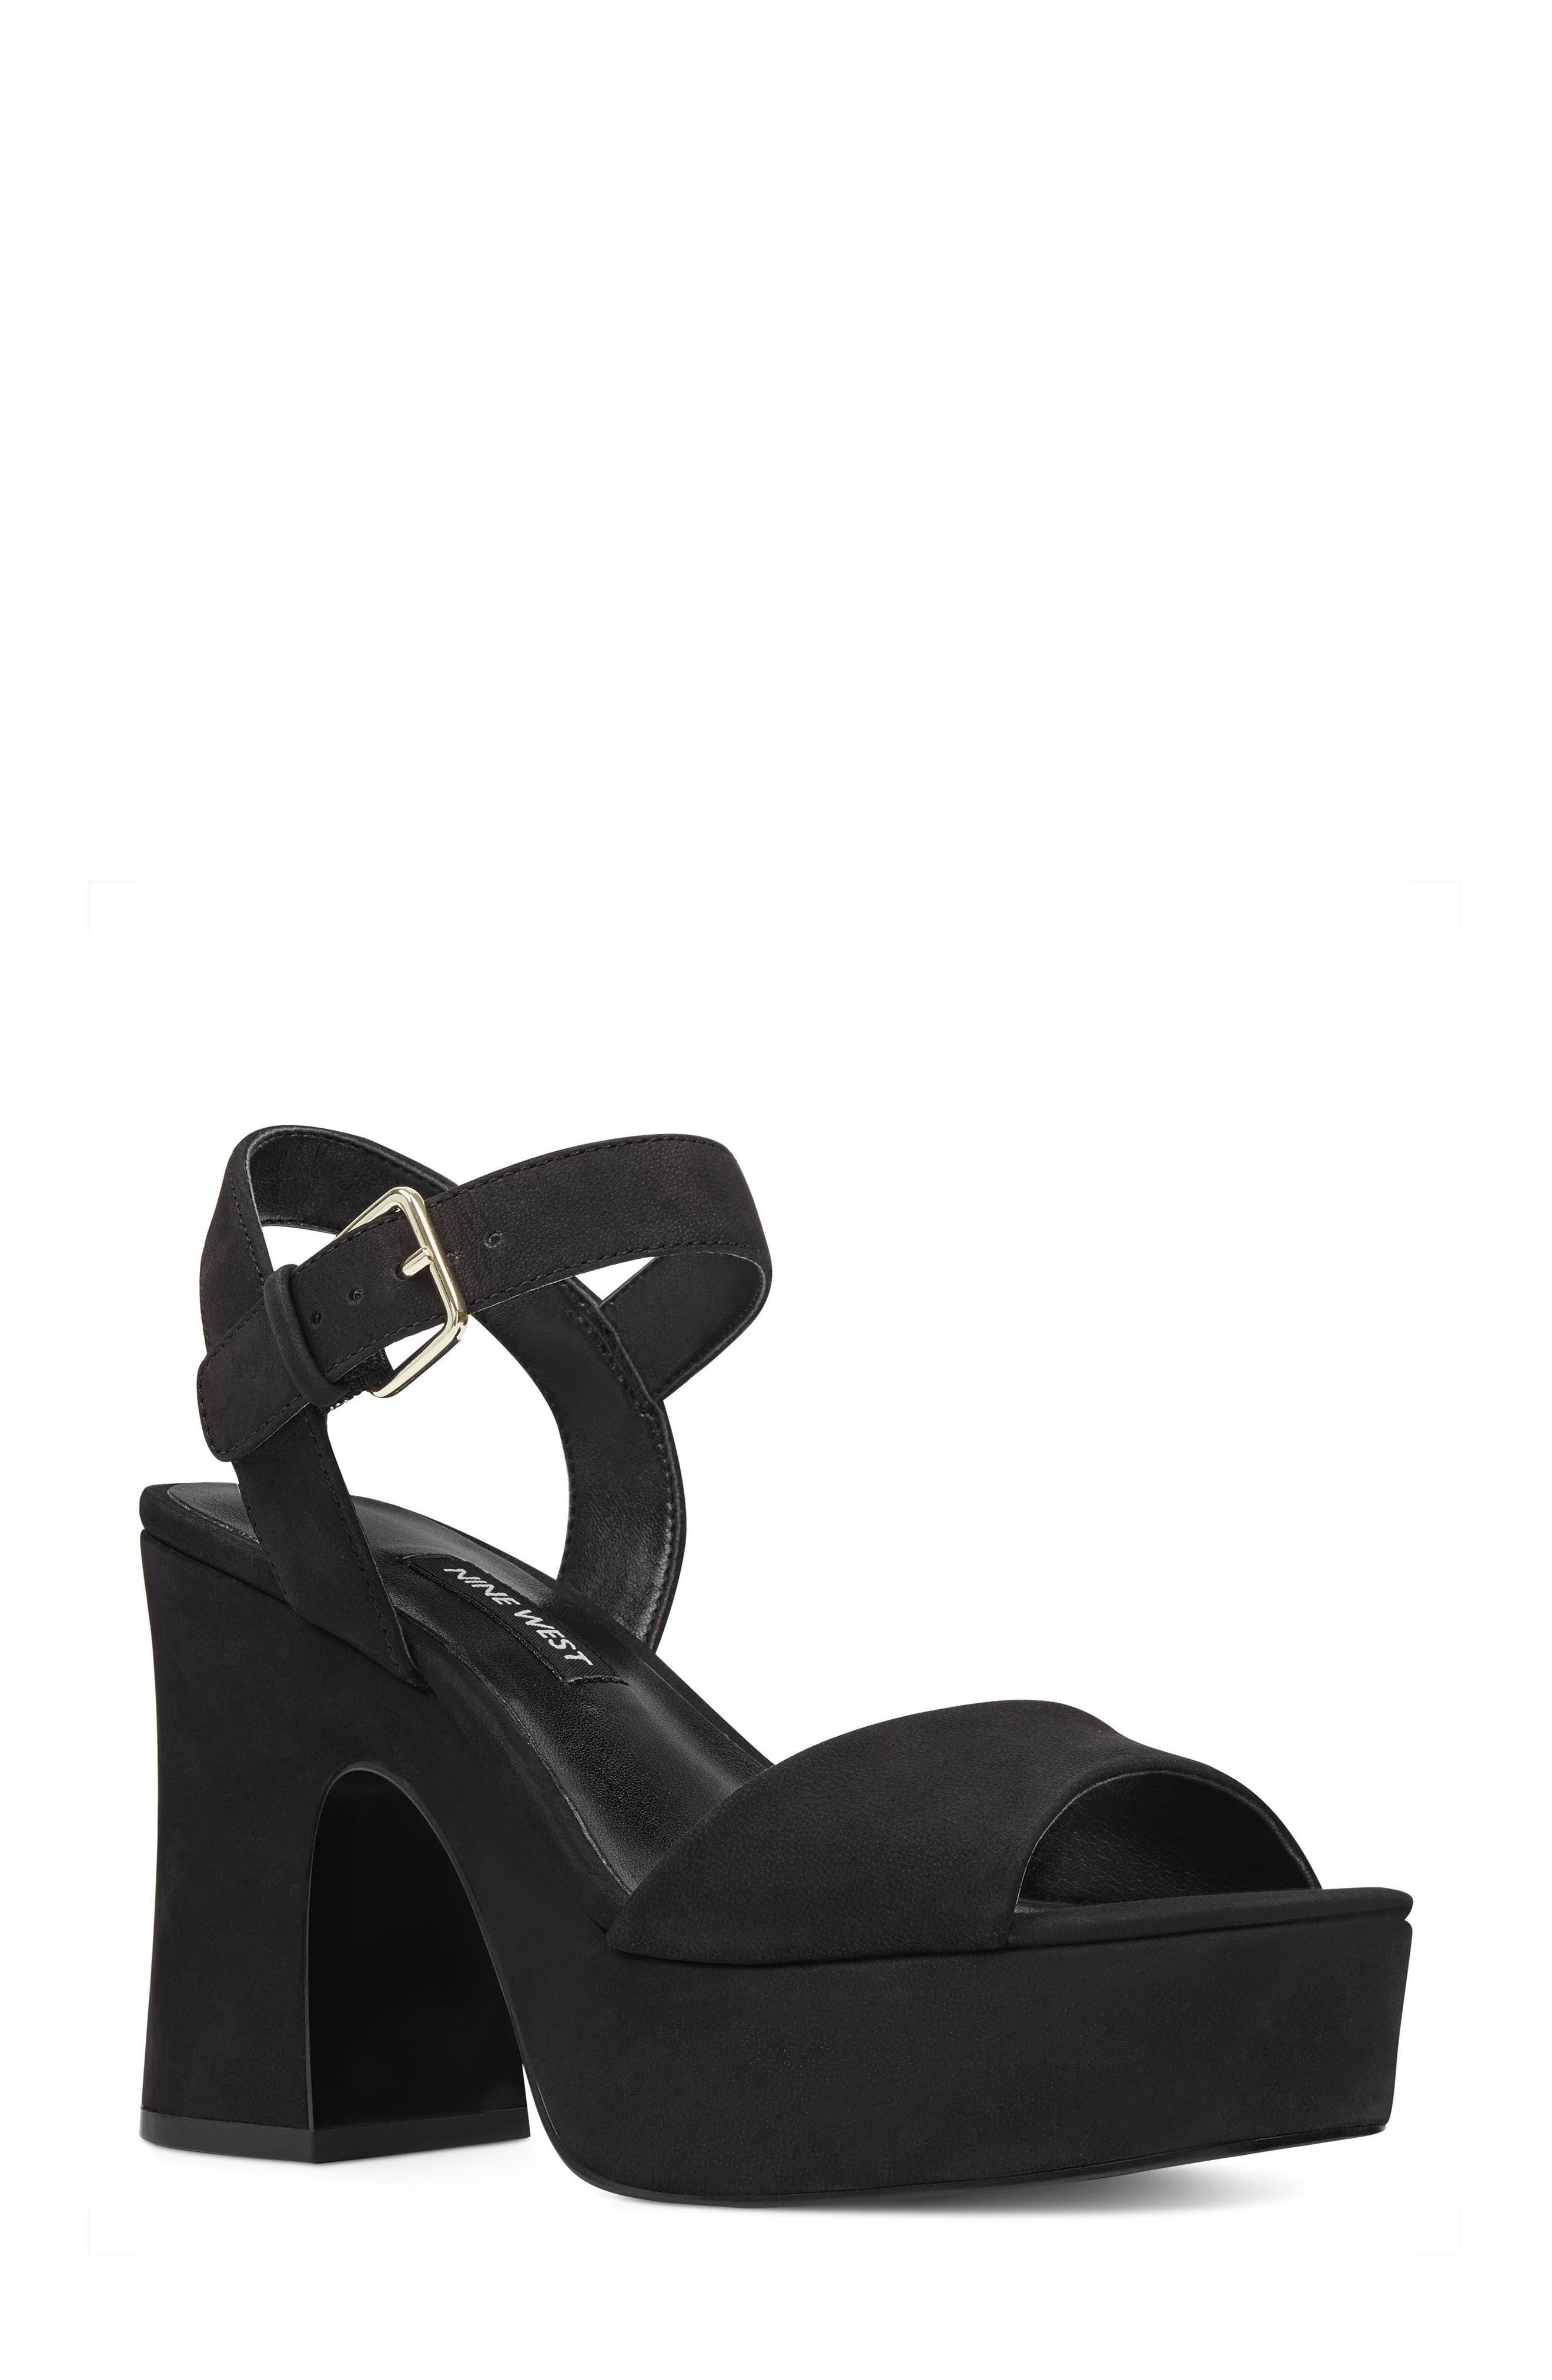 FallForU Platform Sandal,                             Main thumbnail 1, color,                             Black Leather